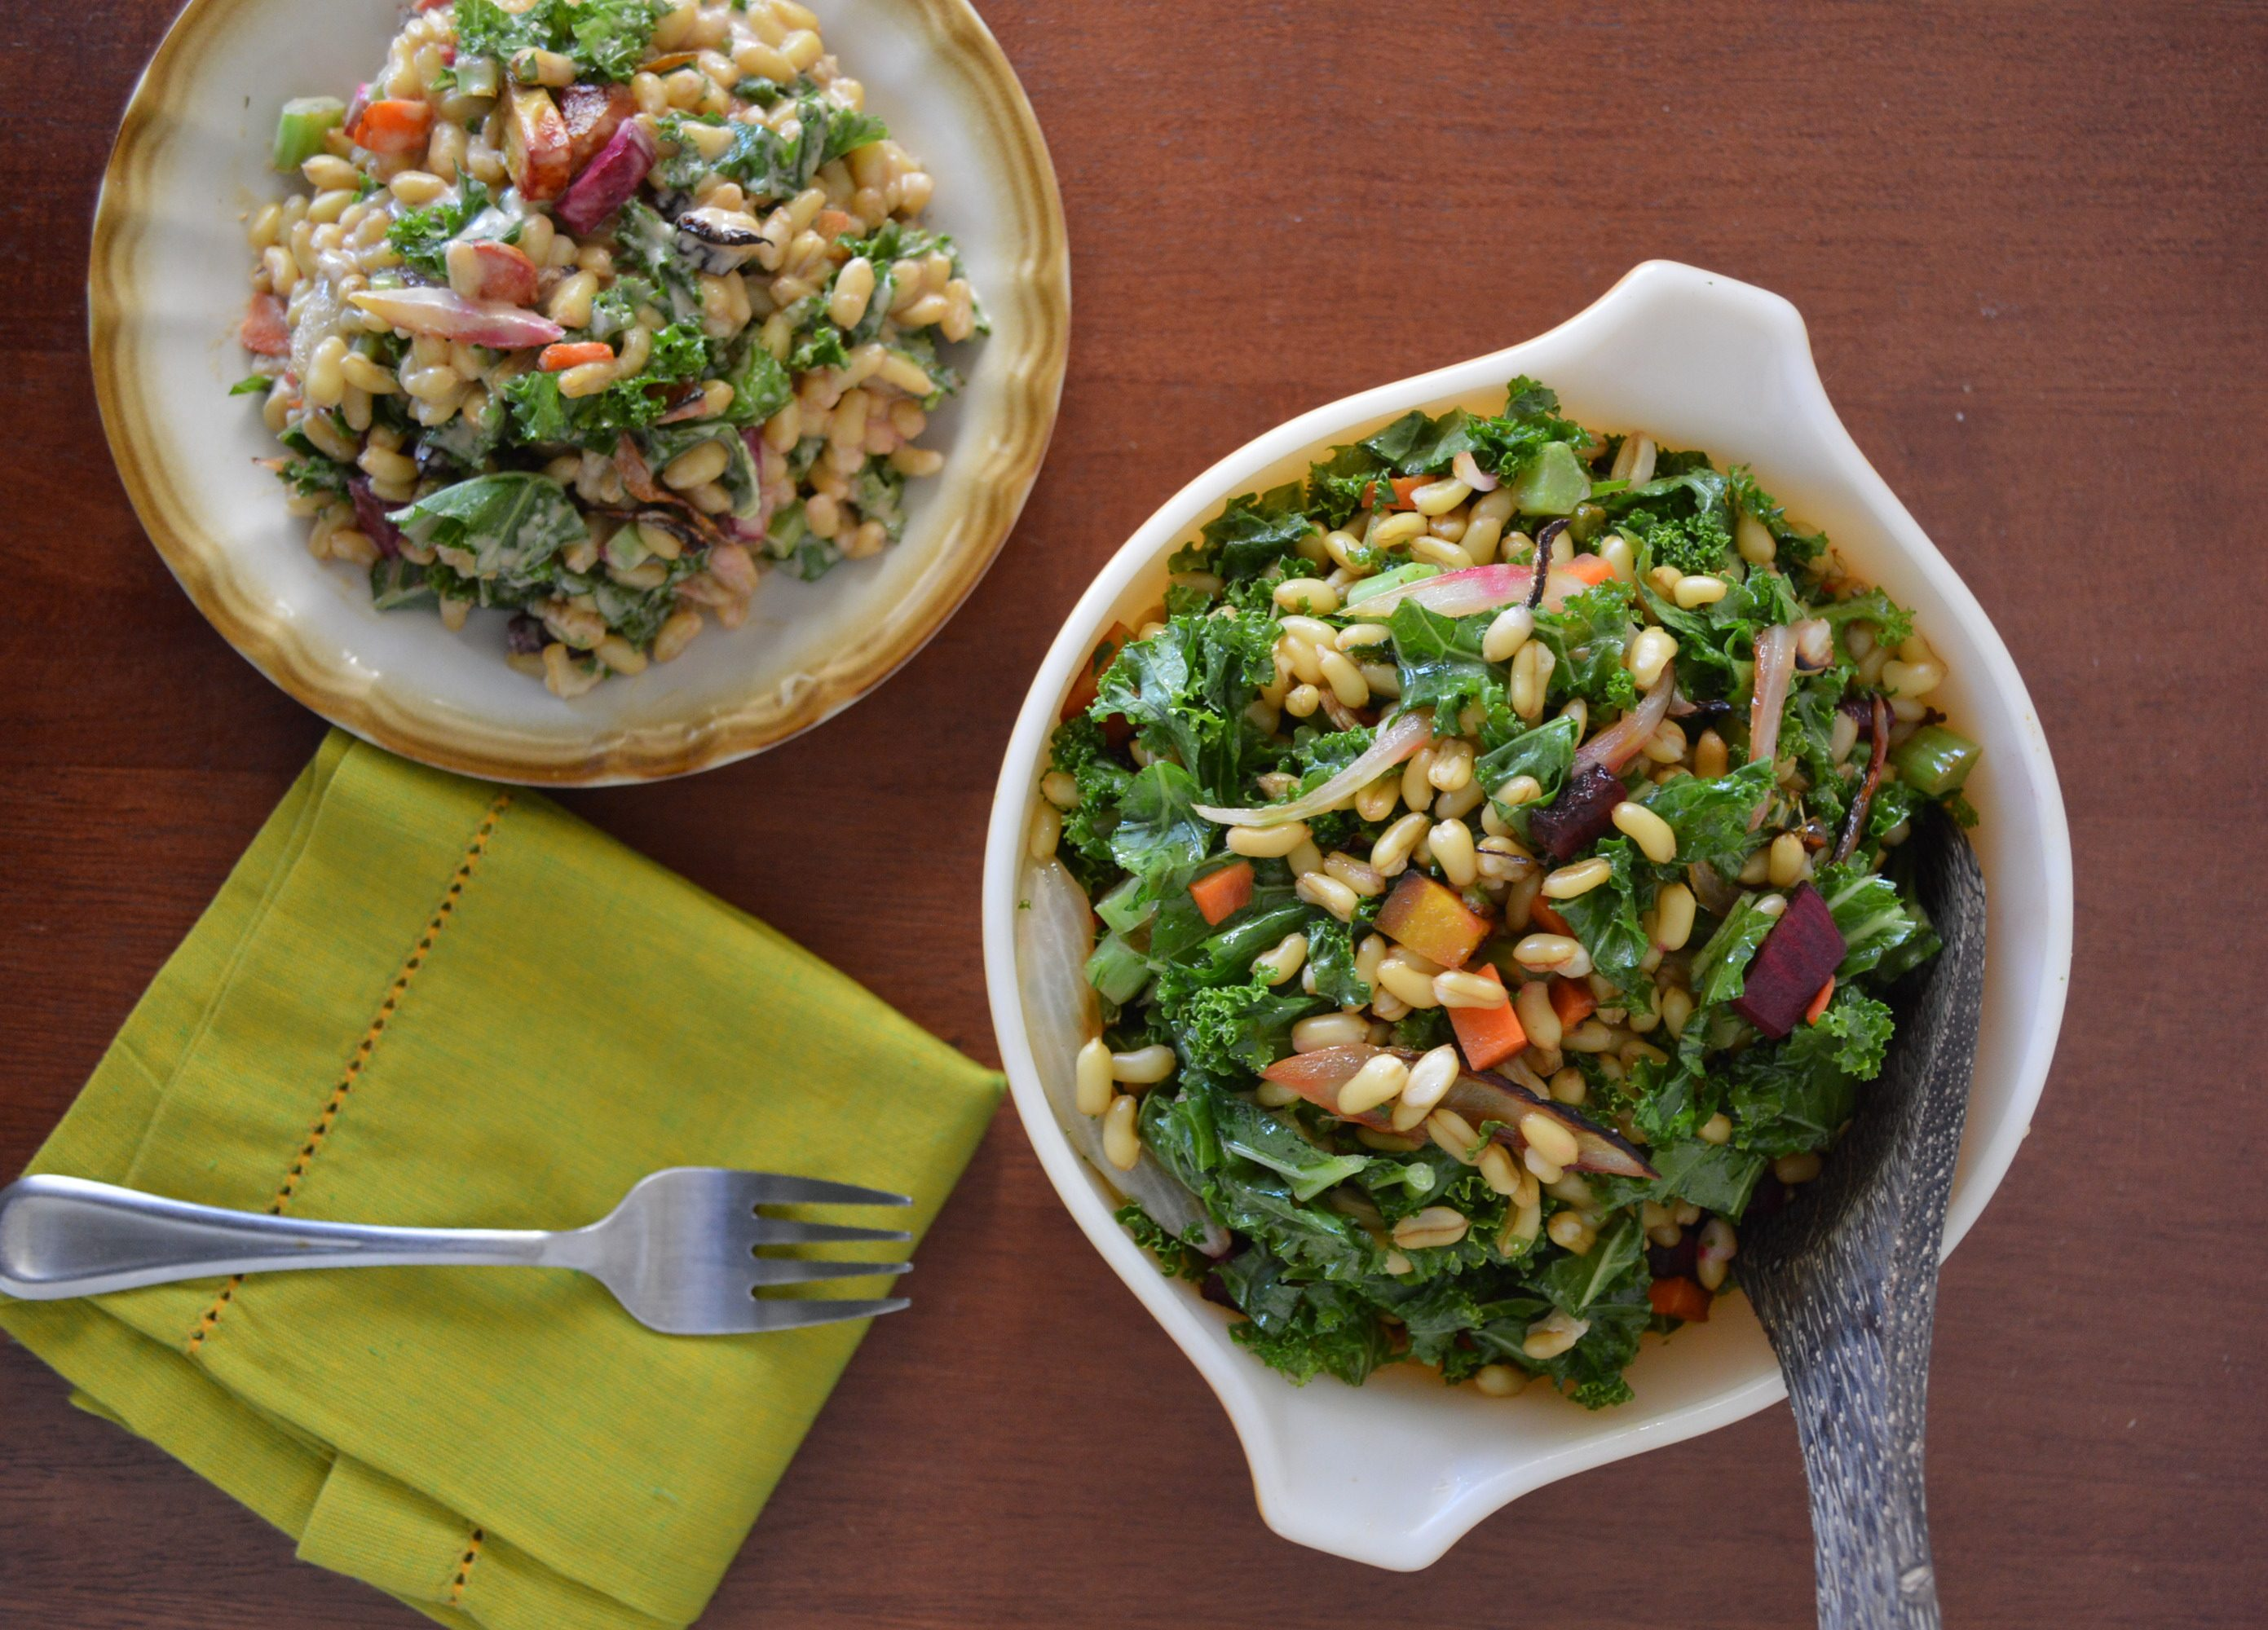 kale and whole grain salad